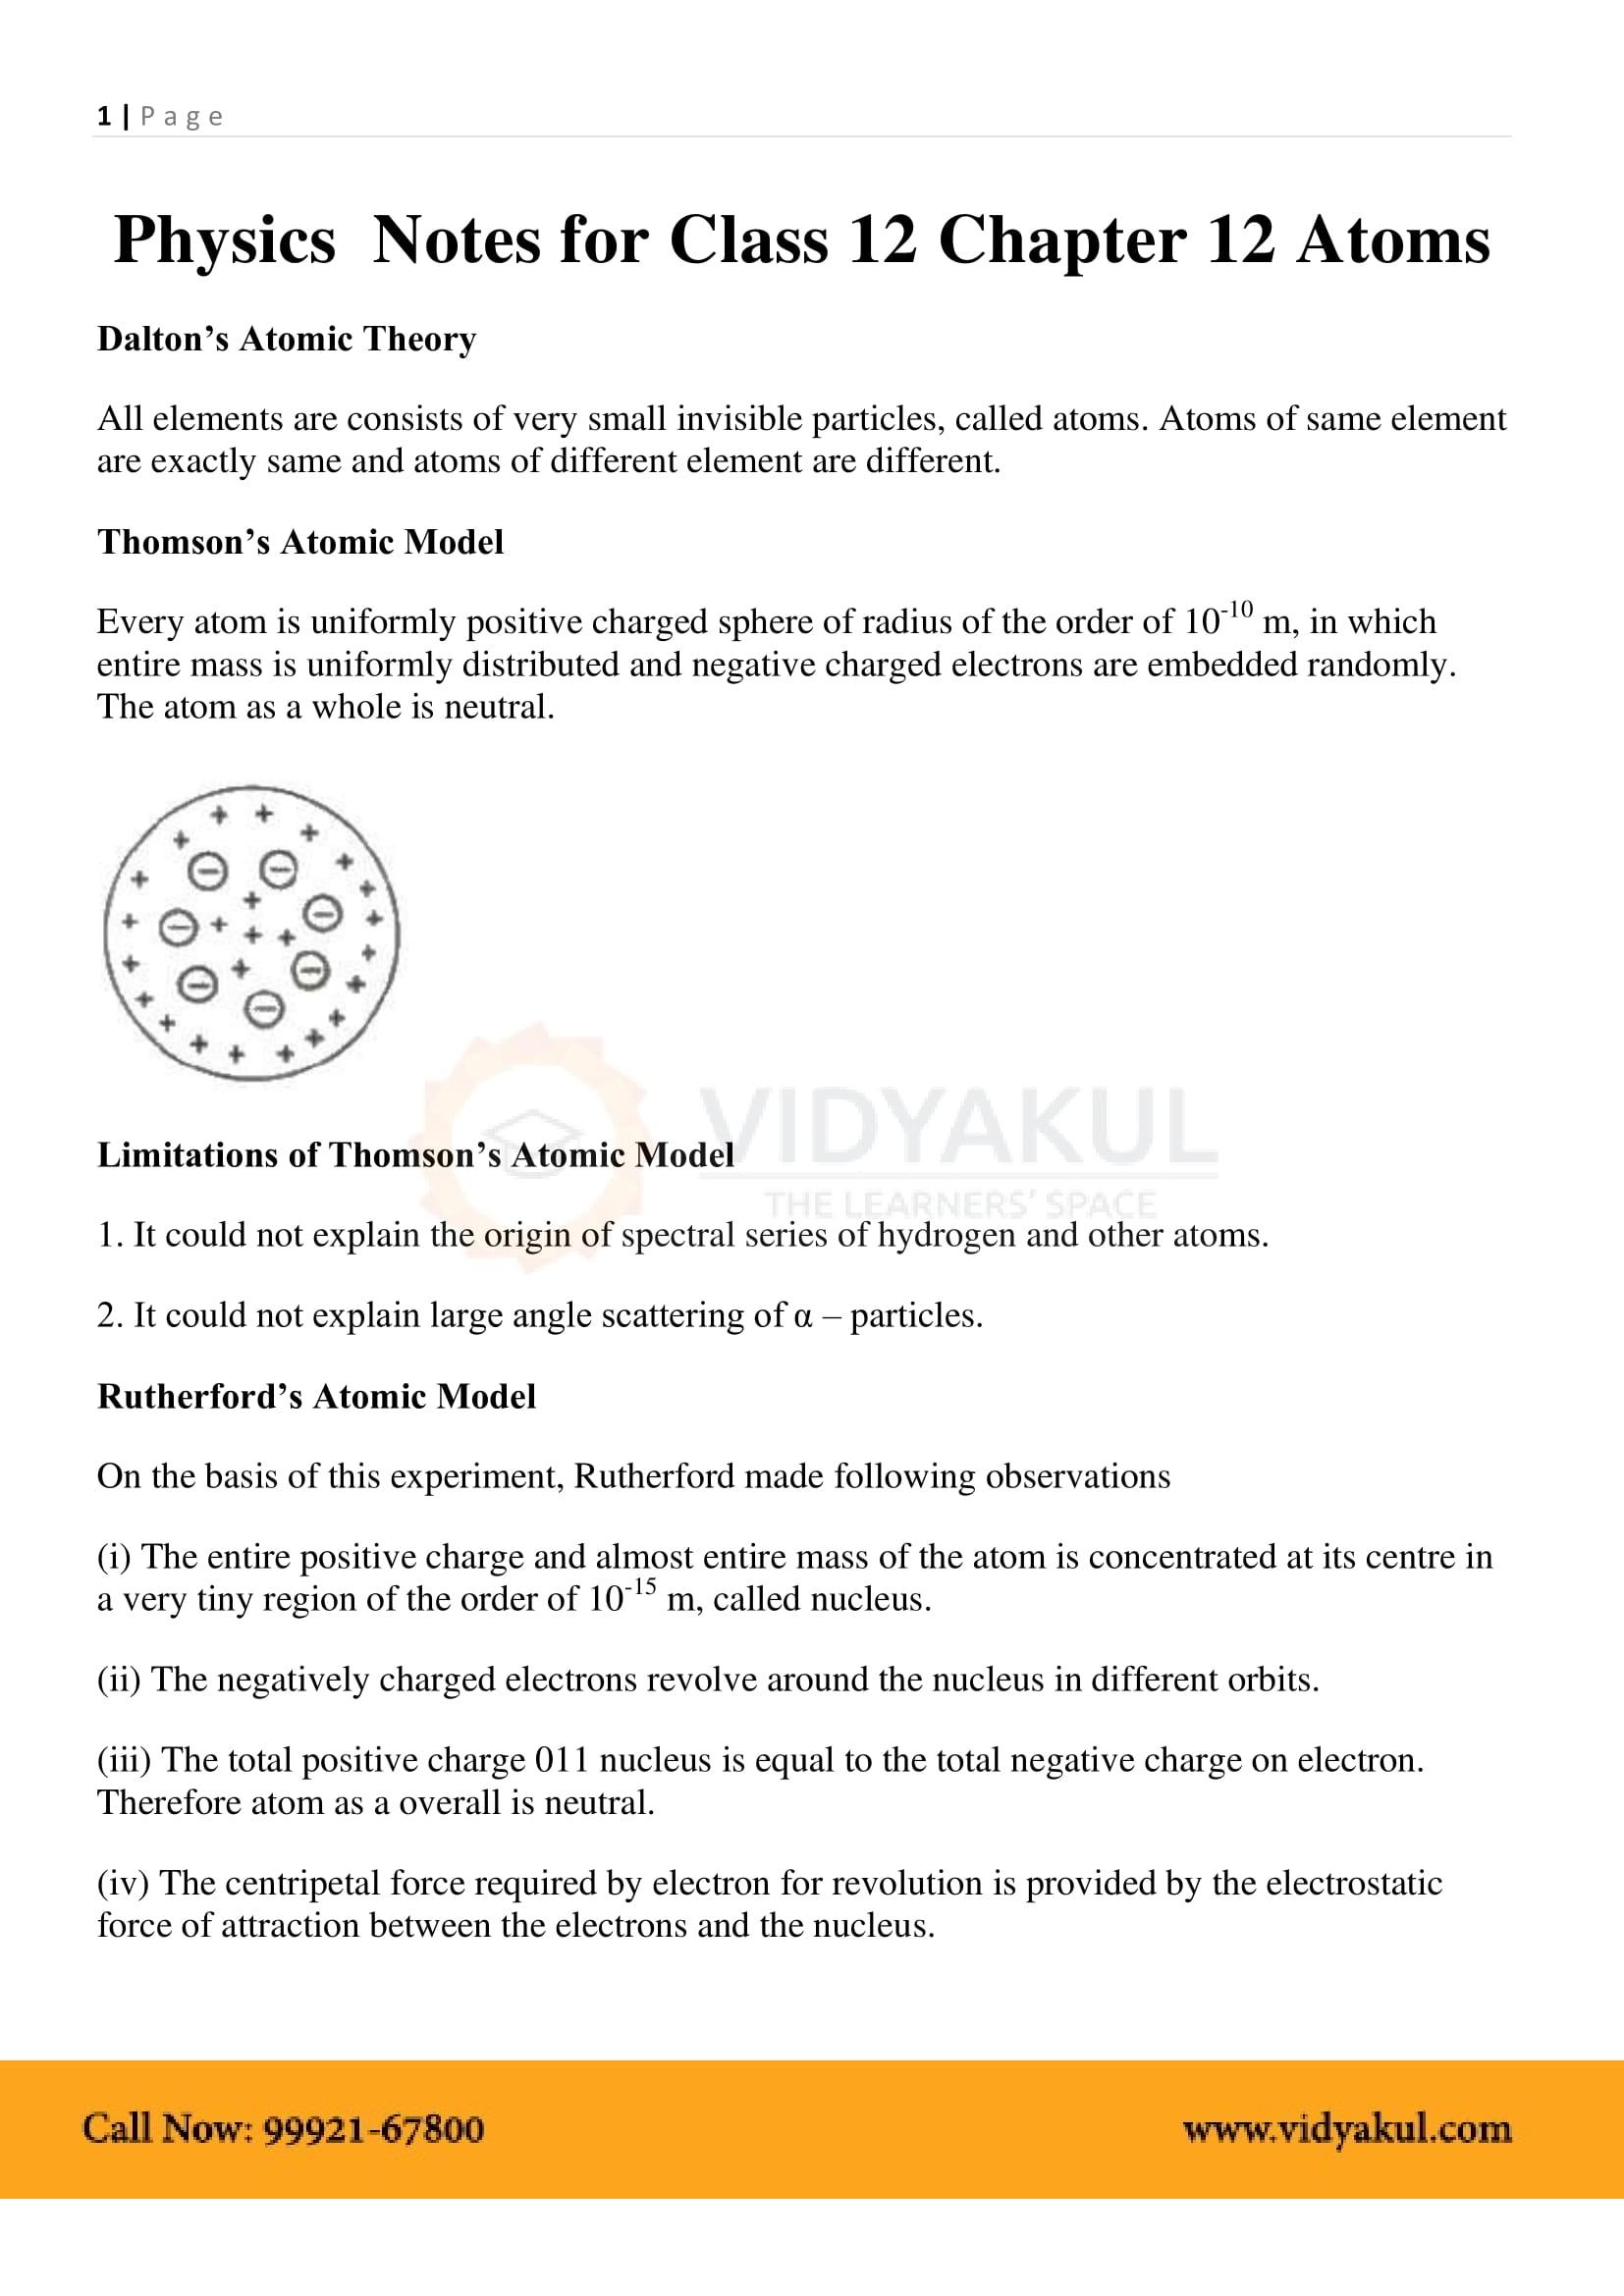 Atoms Class 12 Notes   Vidyakul